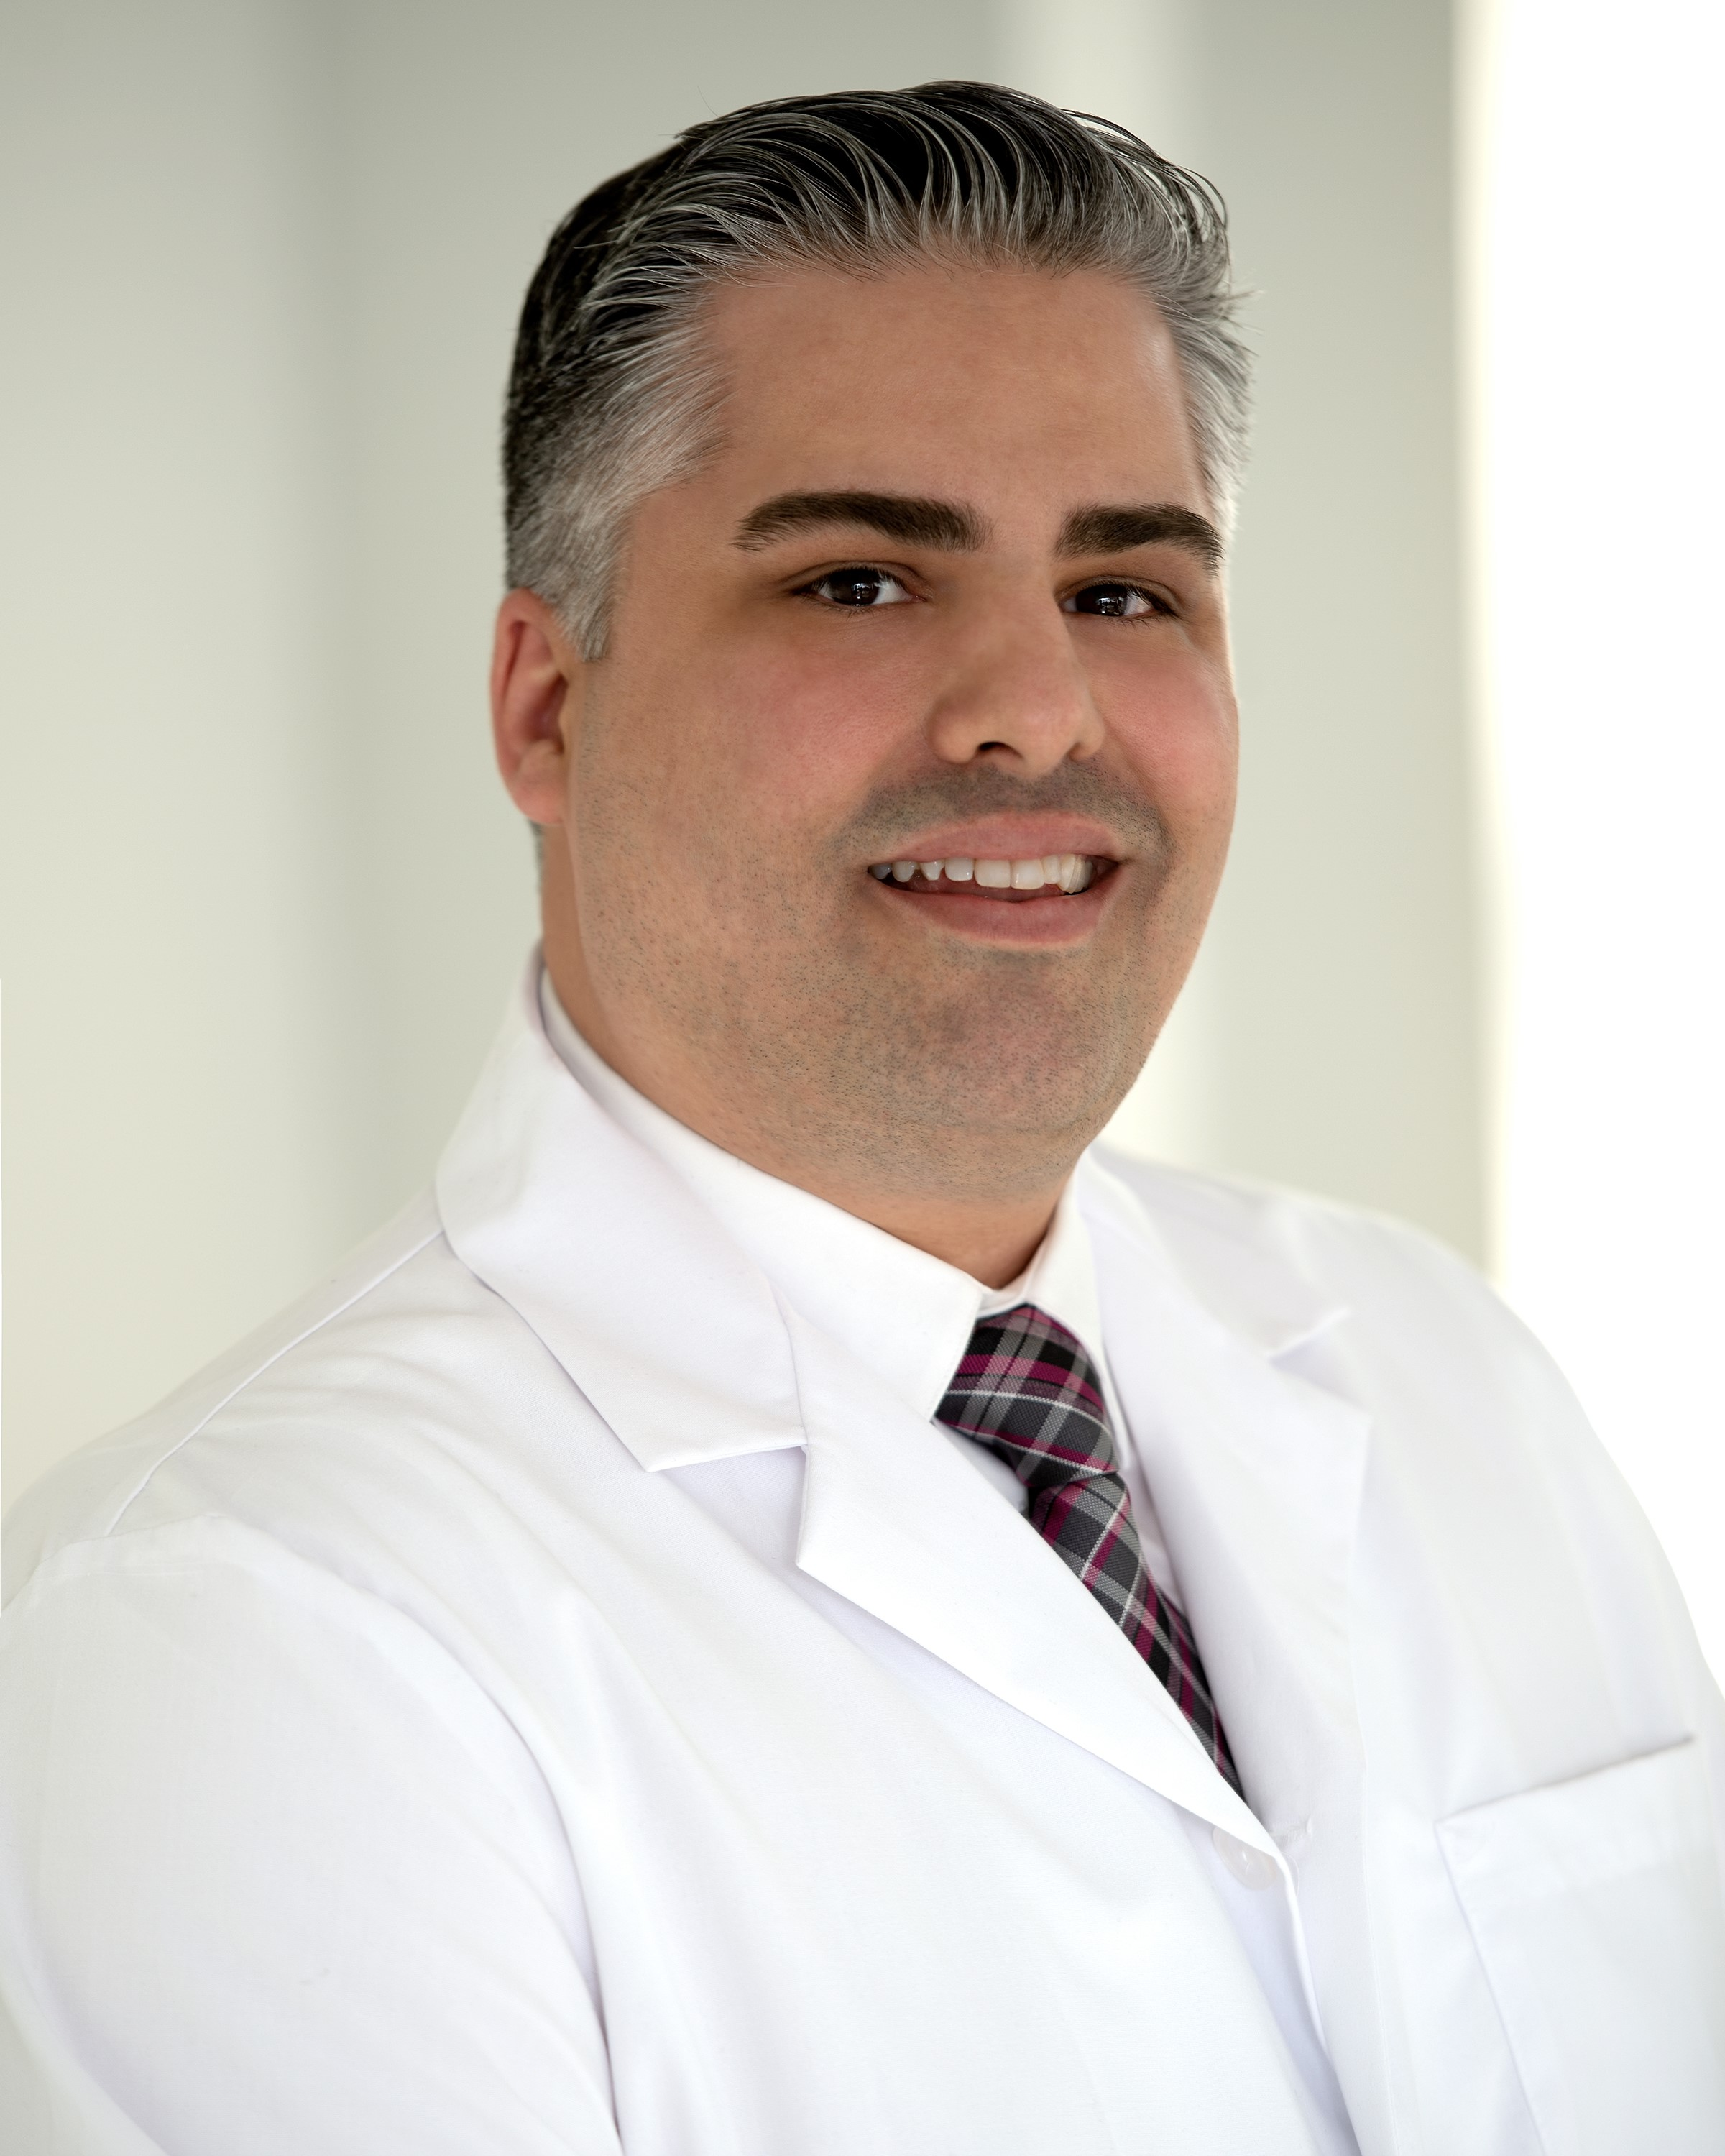 Robert Bongiorno, DDS